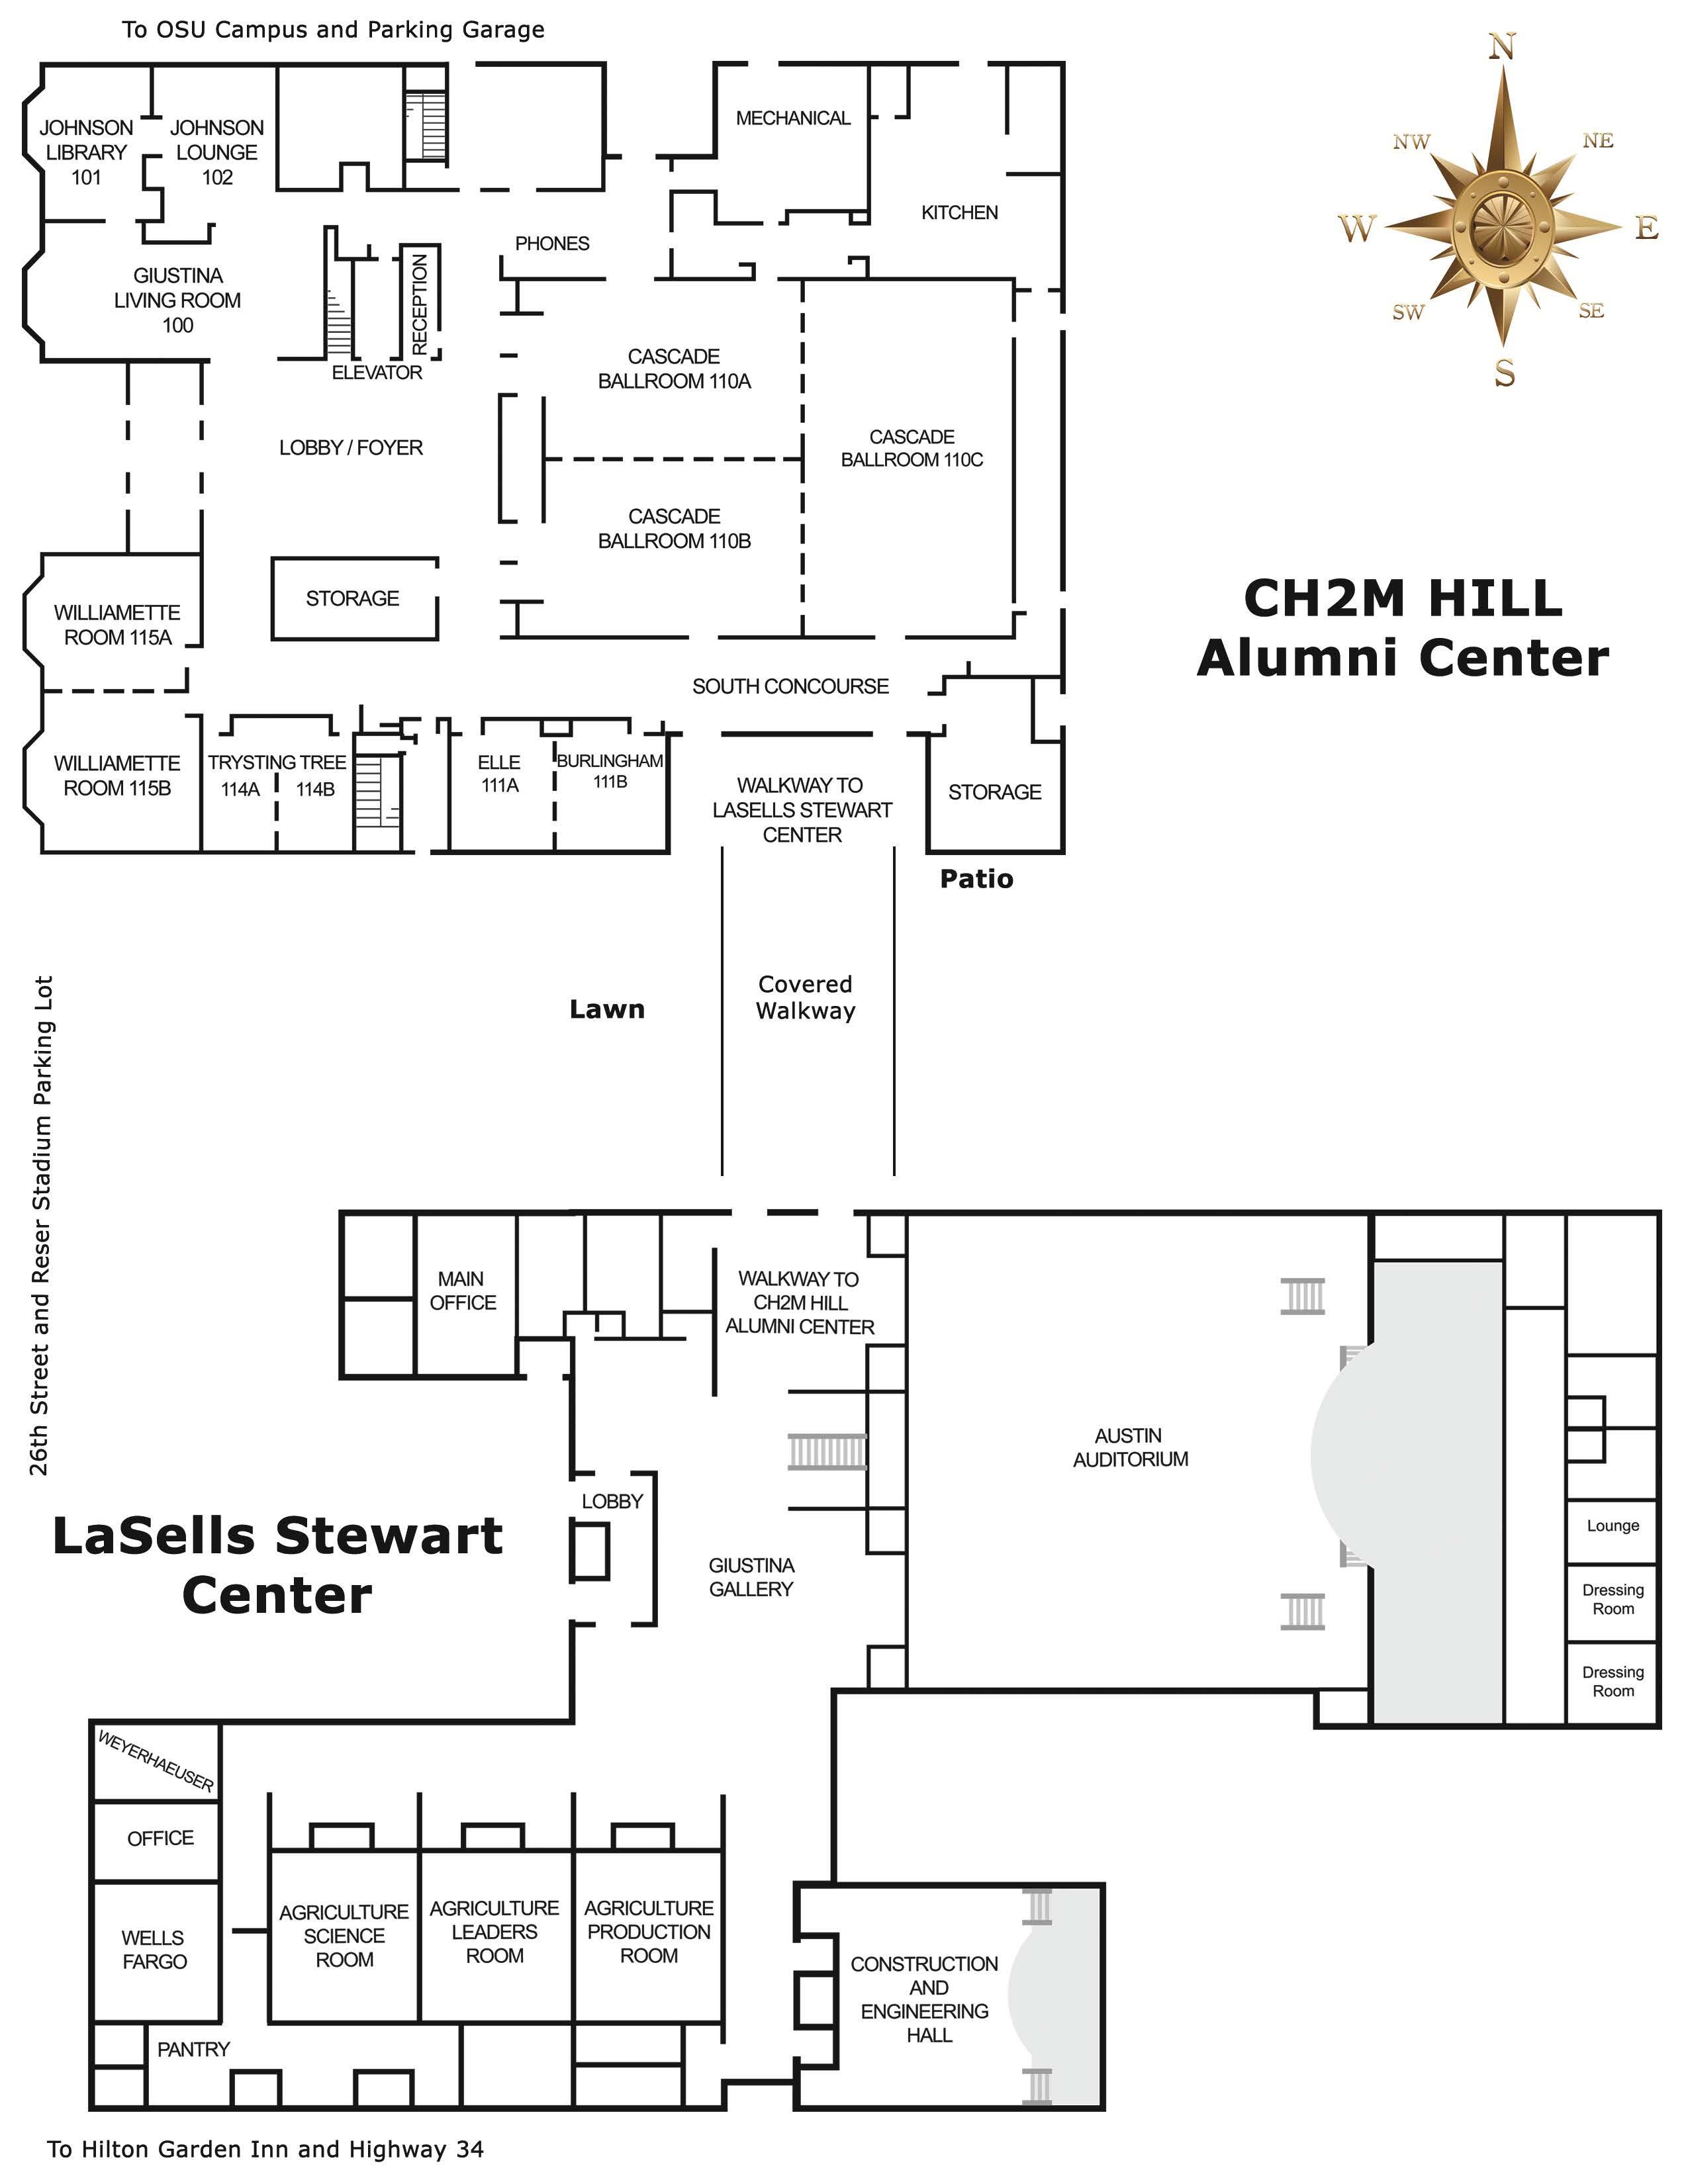 Venue Map The Lasells Stewart Center Oregon State University